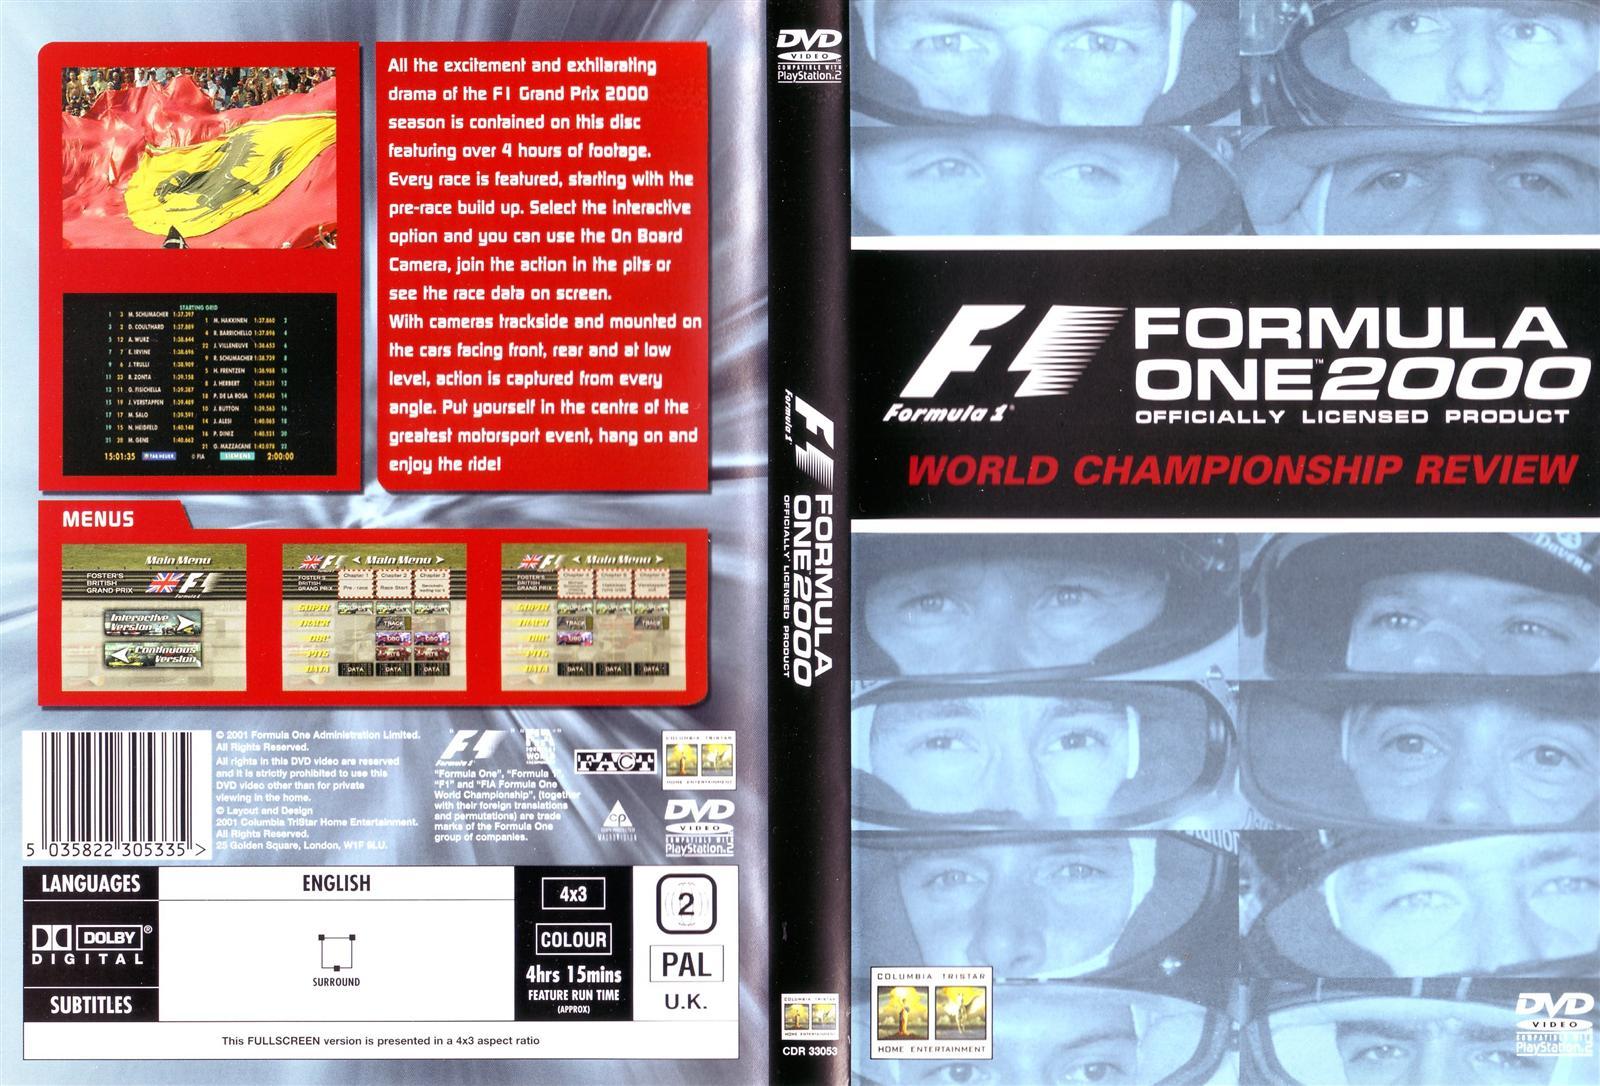 Grand Prix Racing >> Formula 1 Review DVD/VCRs   The Motor Racing Programme ...